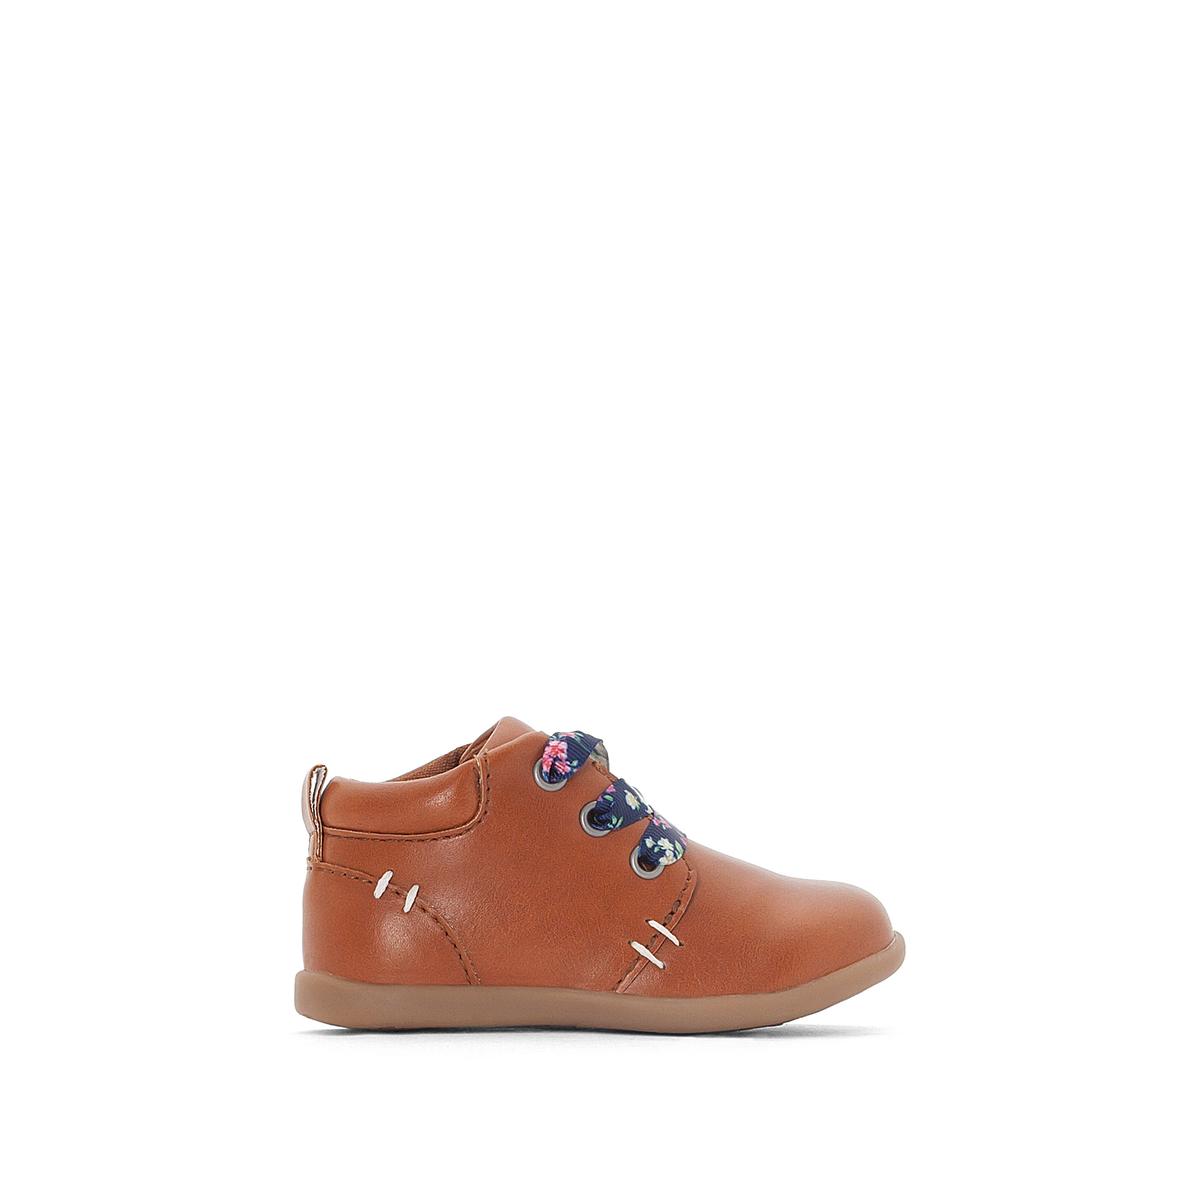 Ботинки на шнуровке либерти 19-25